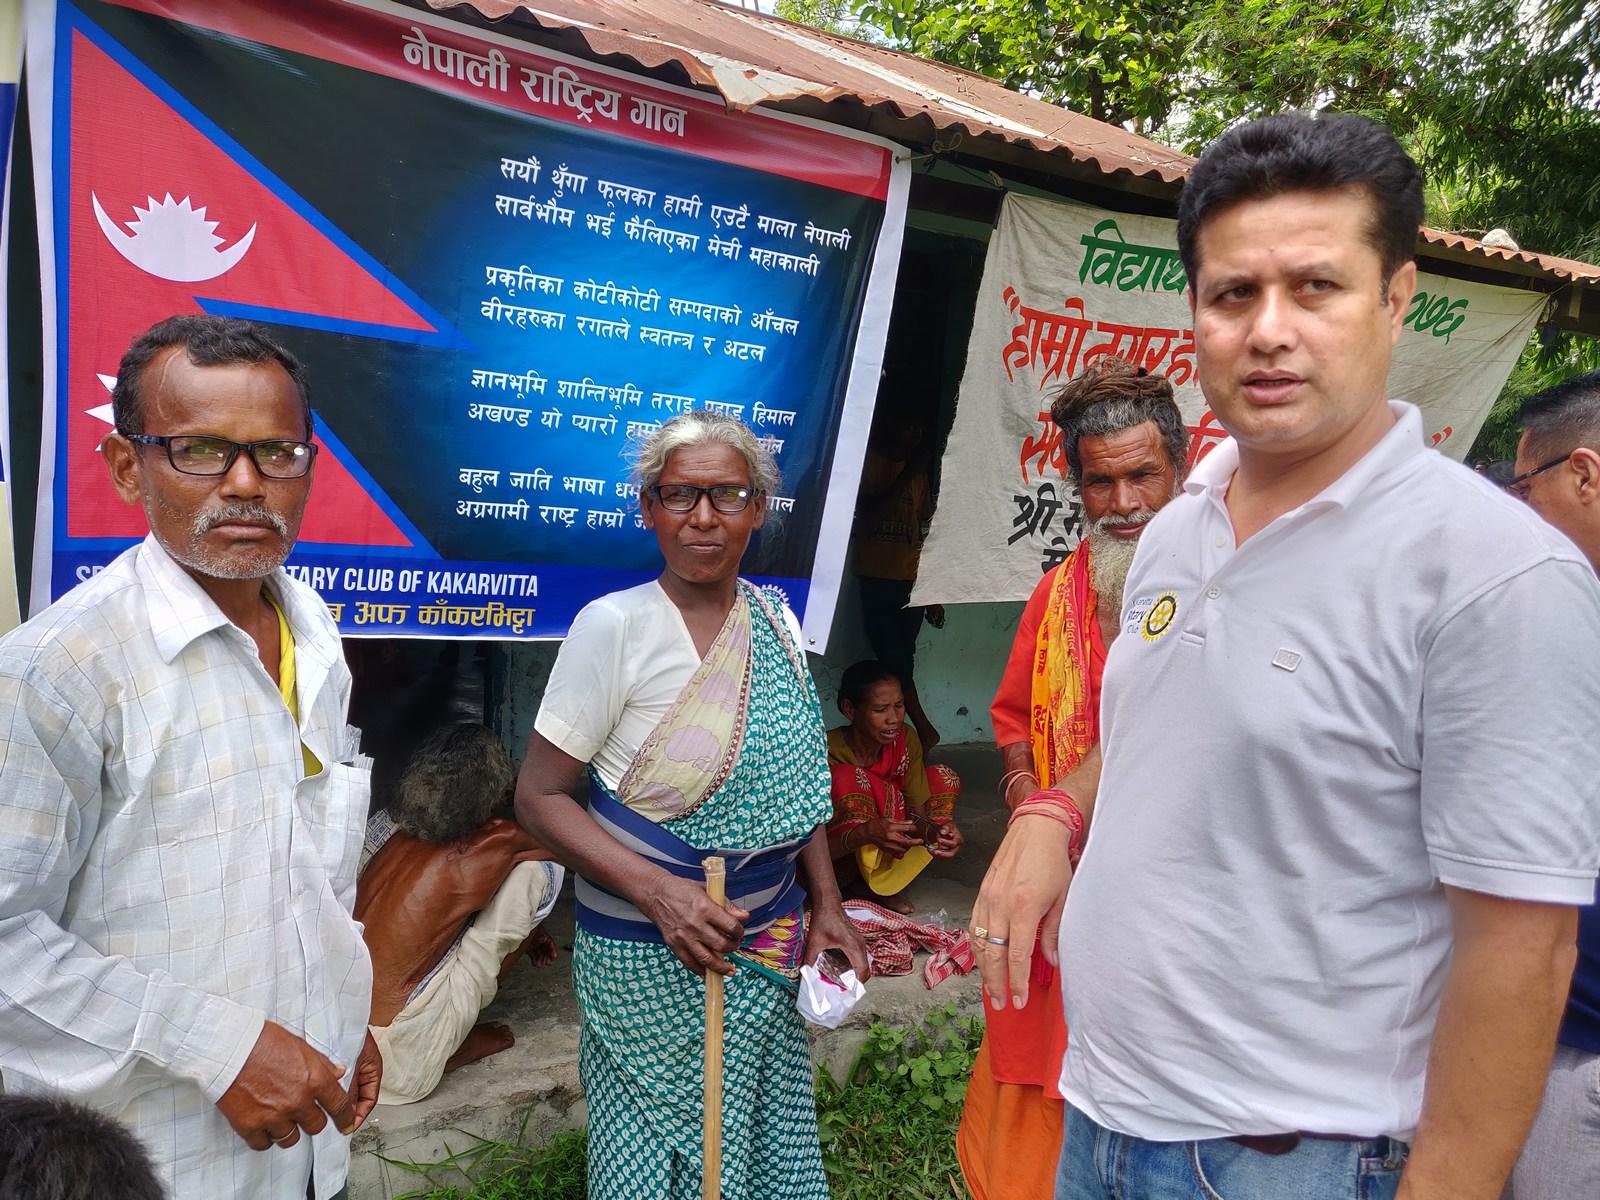 Free-Health-Camp-Eye-Screening-at-Gwala-Basti-Mechinagar-15-Jhapa-Nepal-Rotary-Club-of-Kakarvitta-32